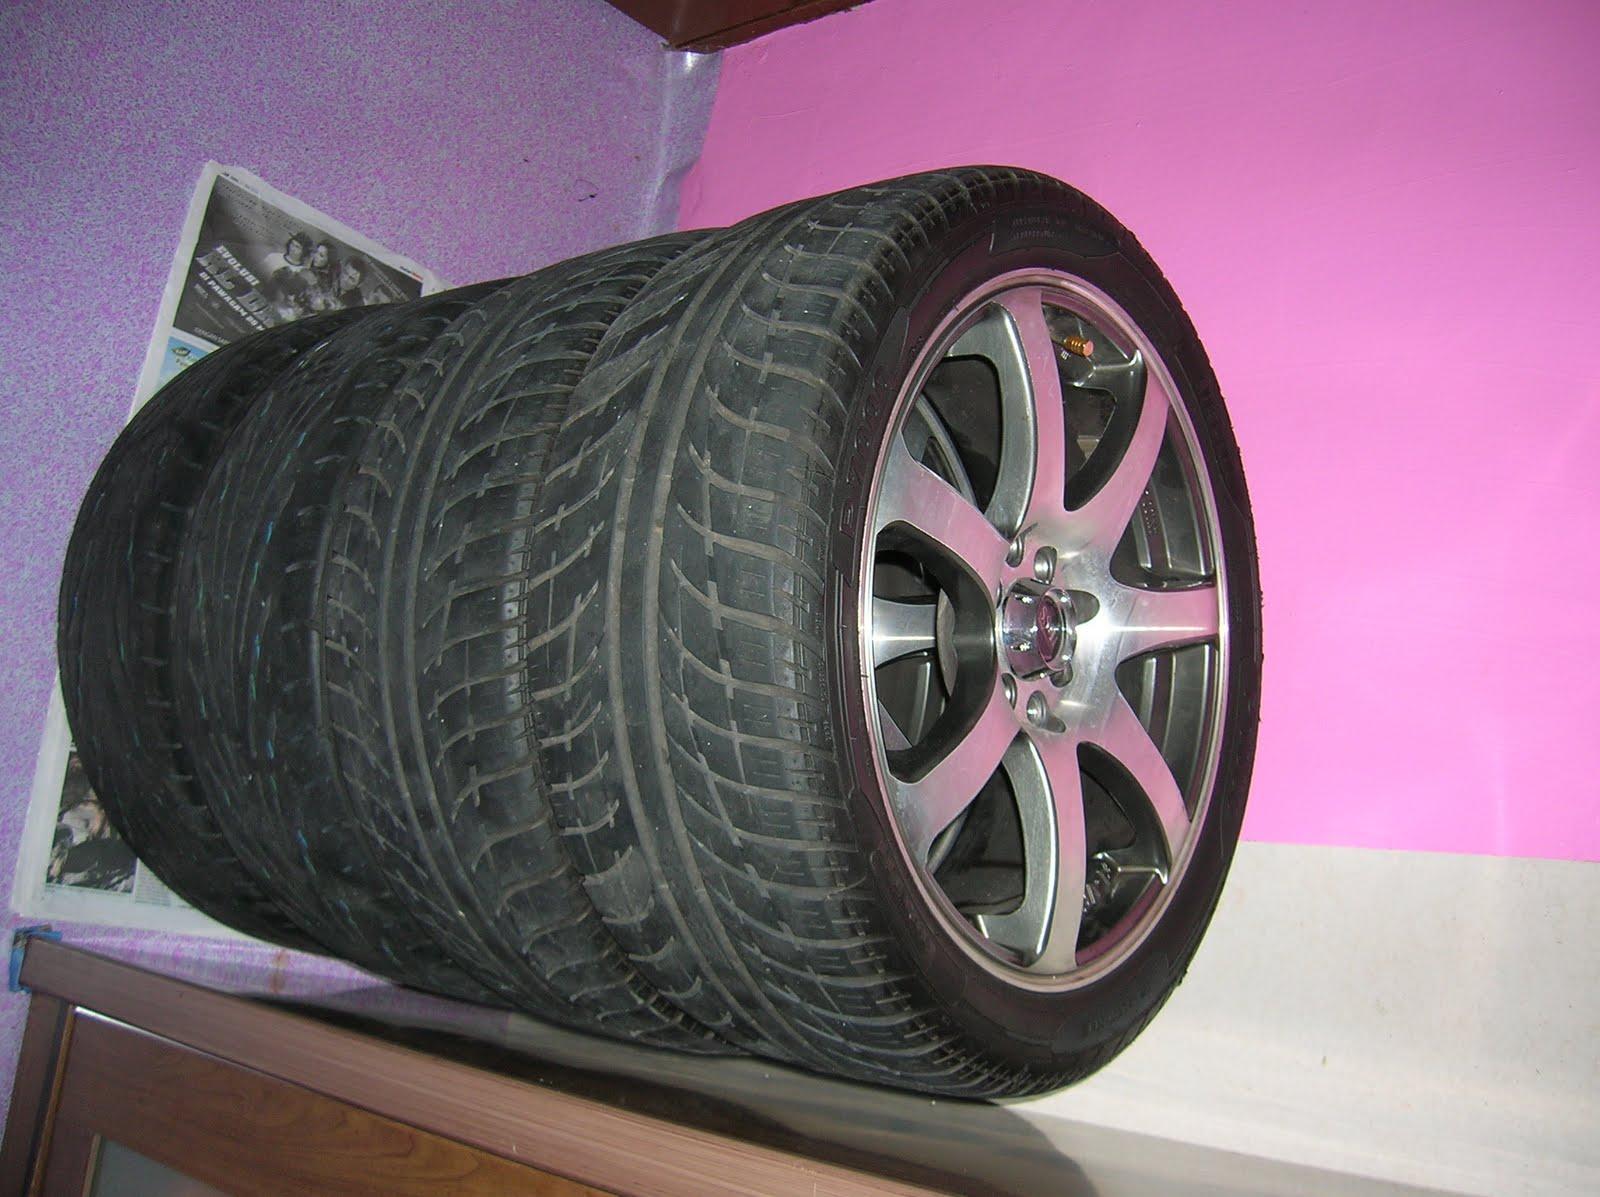 http://2.bp.blogspot.com/_9VDlsmpyoKM/S7Vr9PjuauI/AAAAAAAAARM/Ra83_prjWs4/s1600/tyre+028.JPG